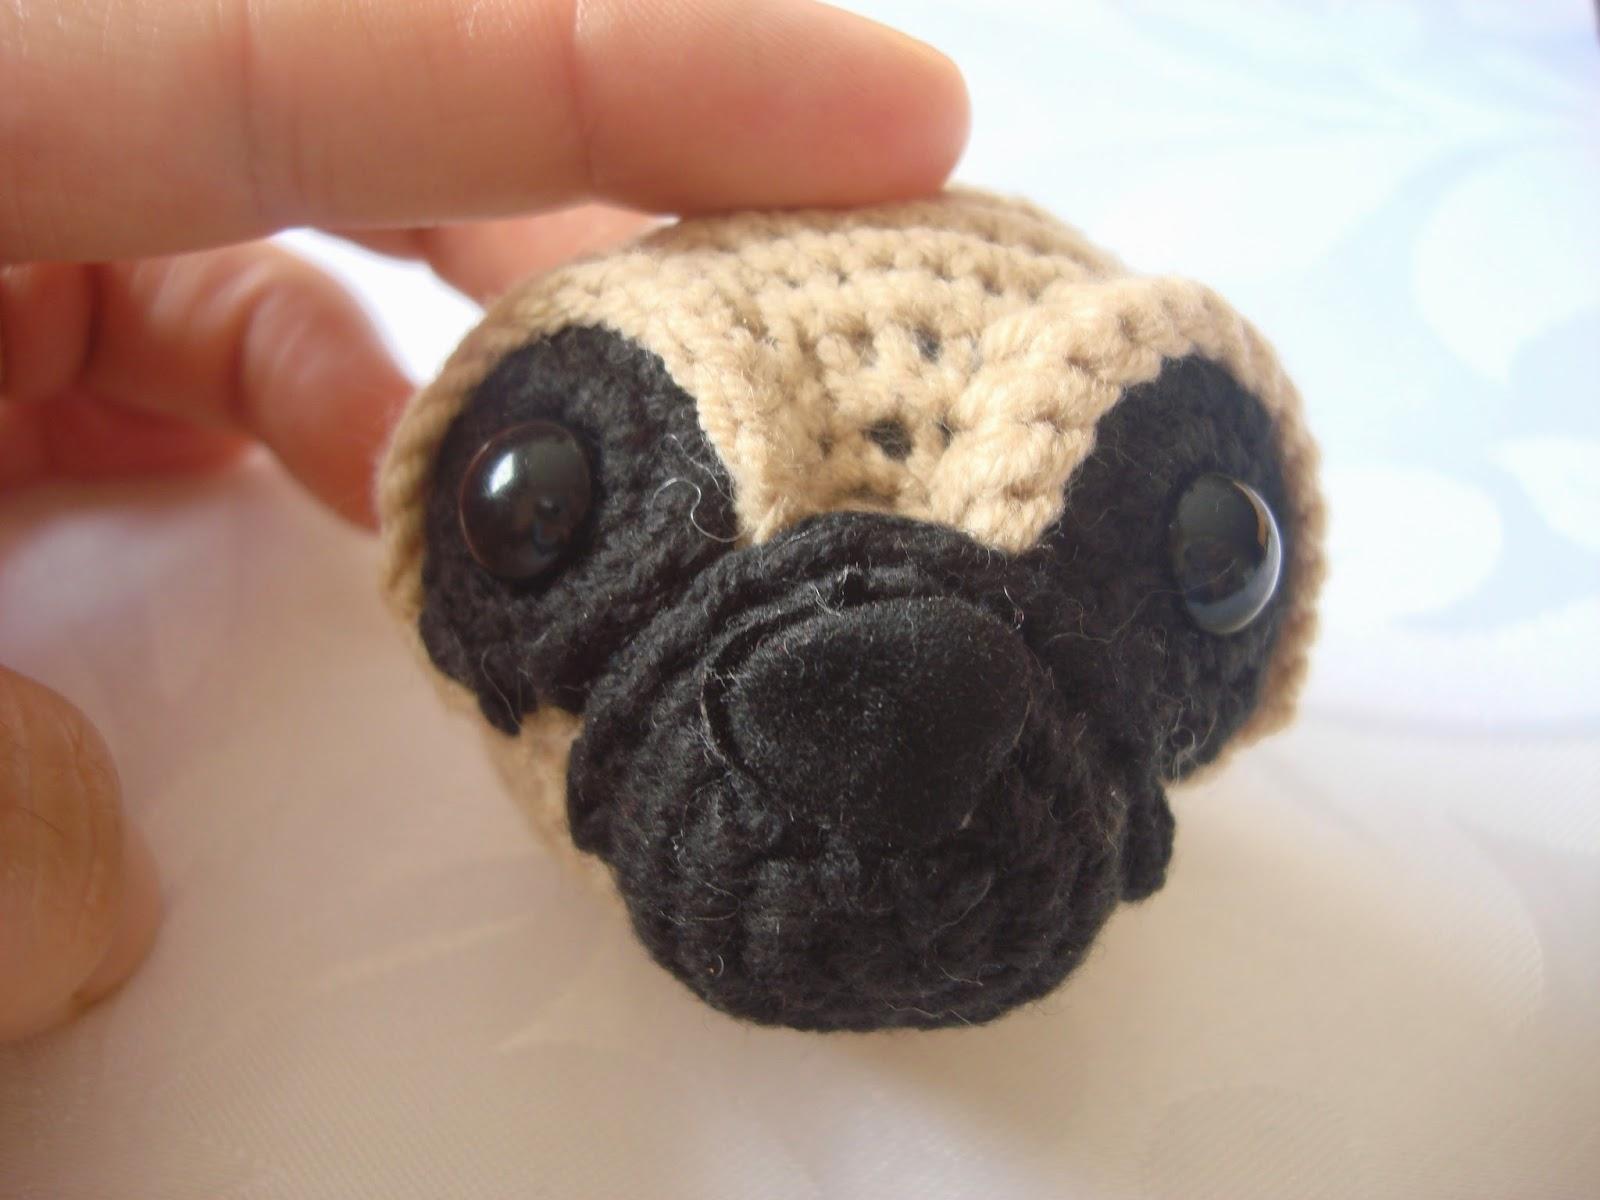 Mini Amigurumi Pug Free Crochet Pattern in 2020 | Crochet animal ... | 1200x1600